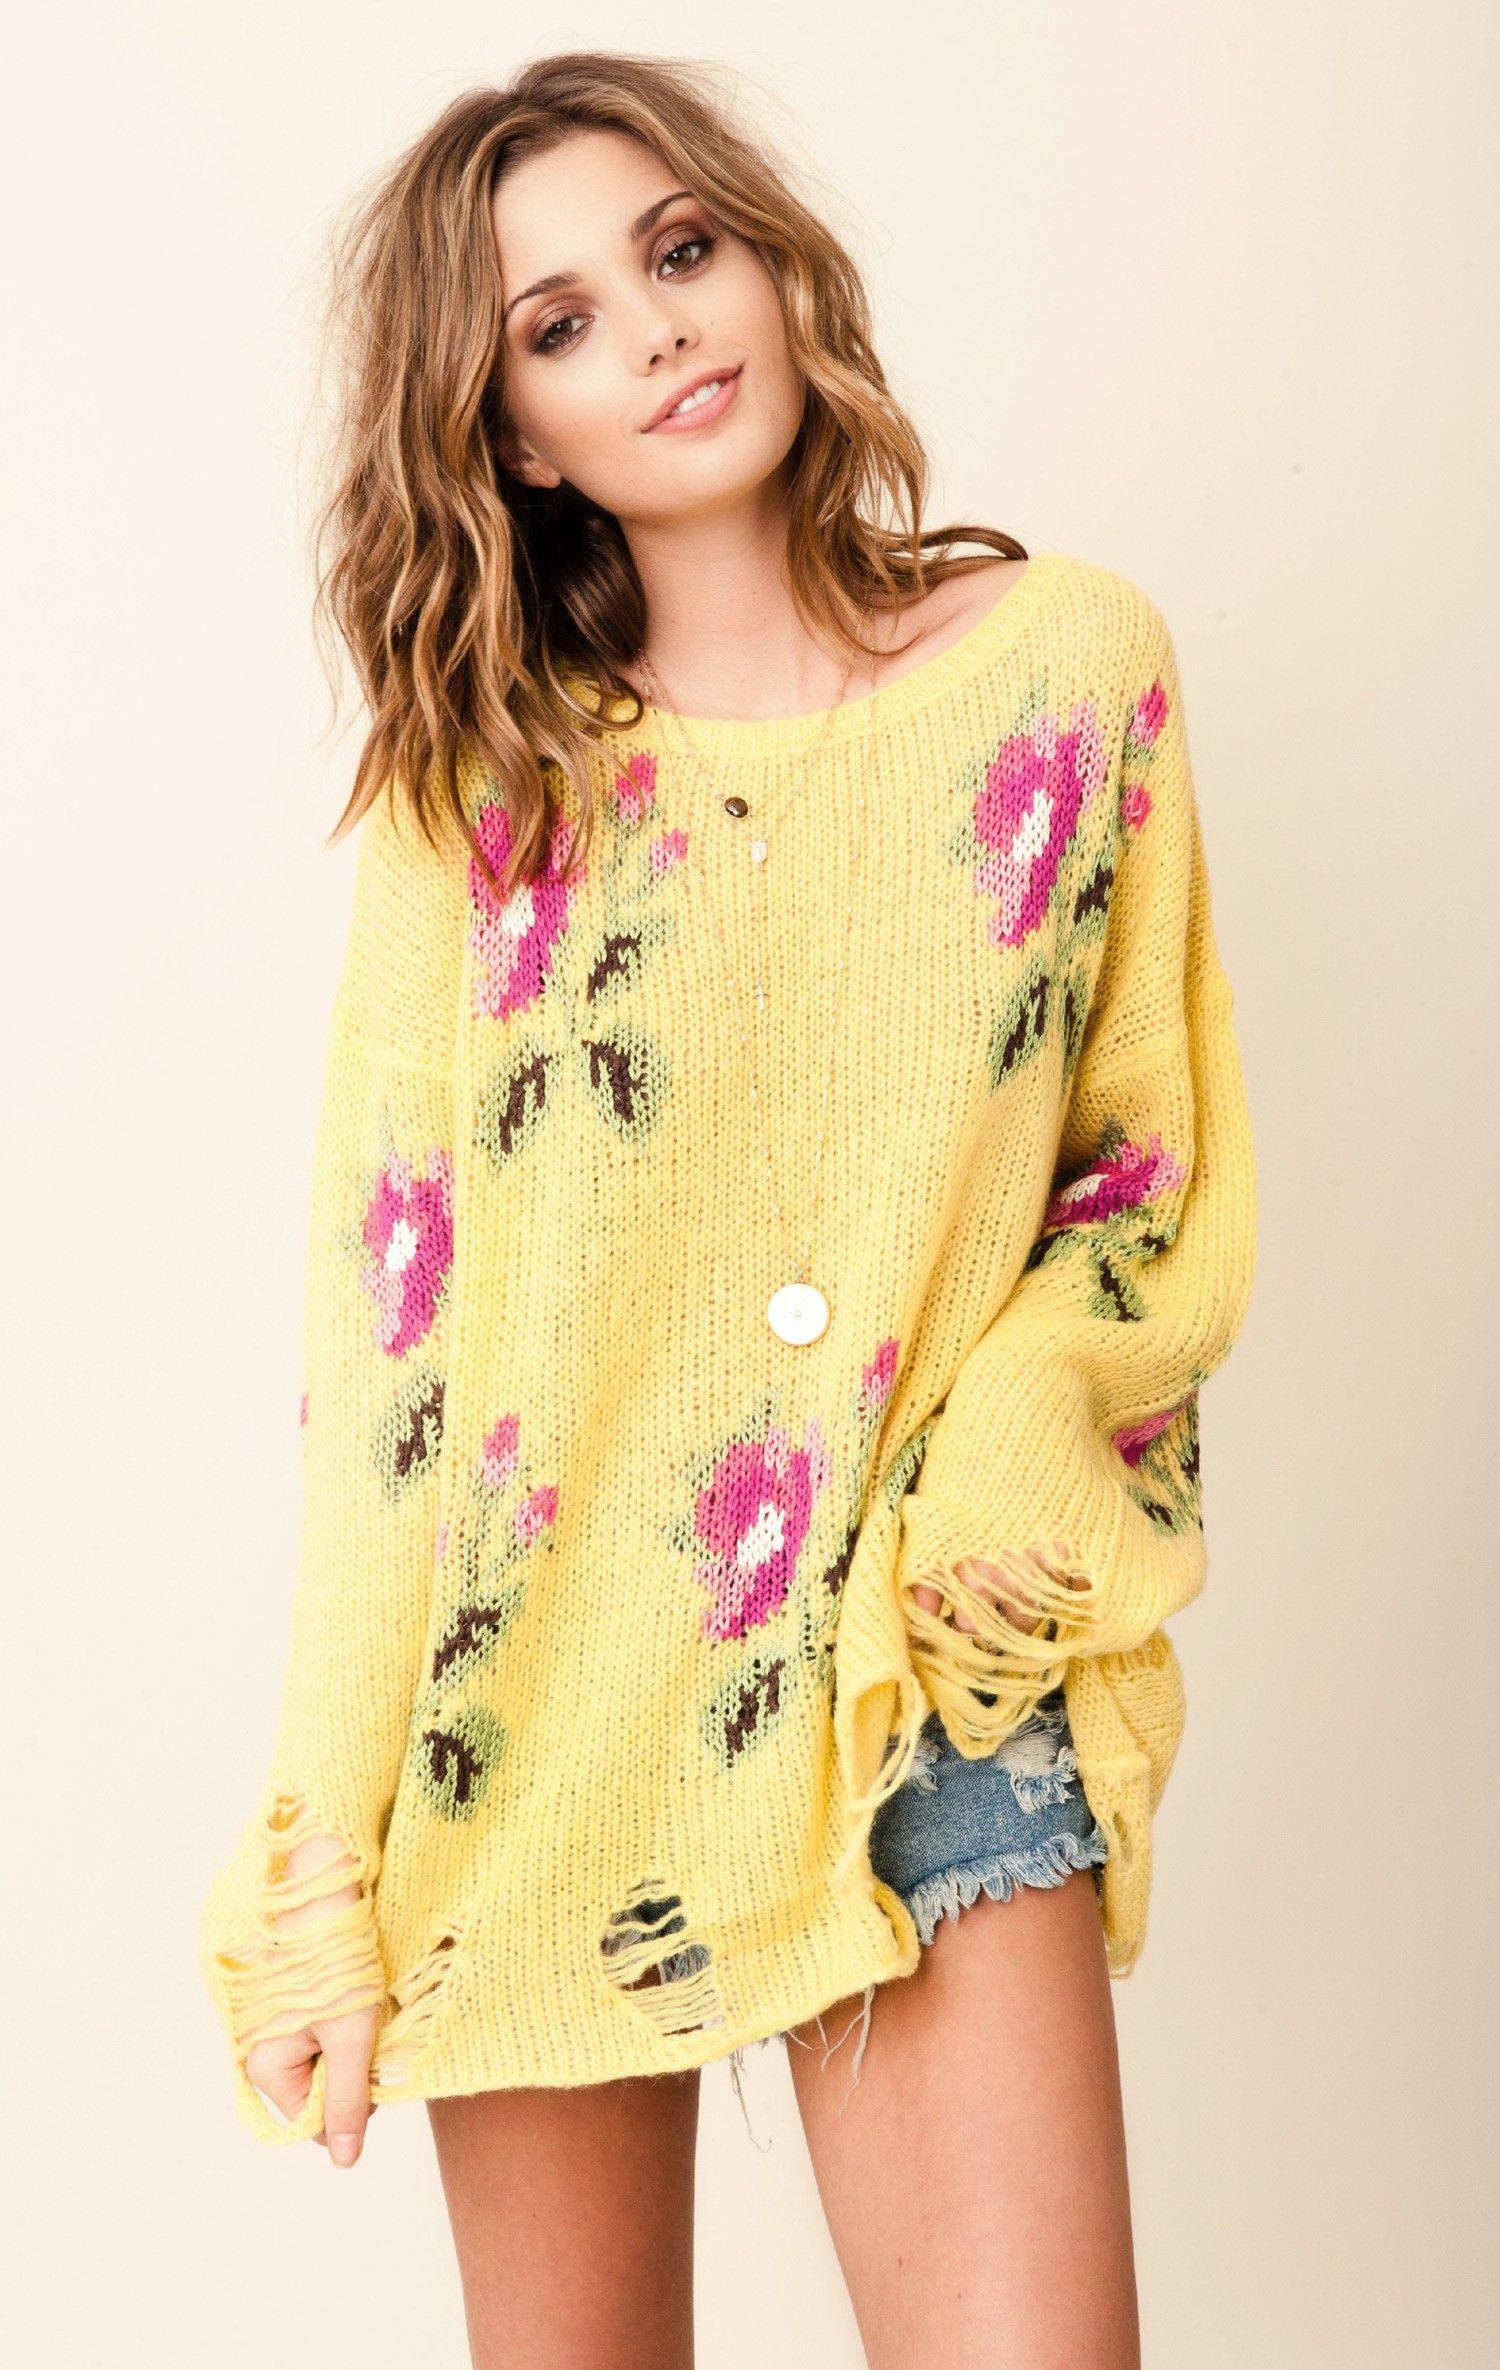 503734e4de073a Lennon Sweater Little Edie   Good Hair   Sweaters, Fashion, Style